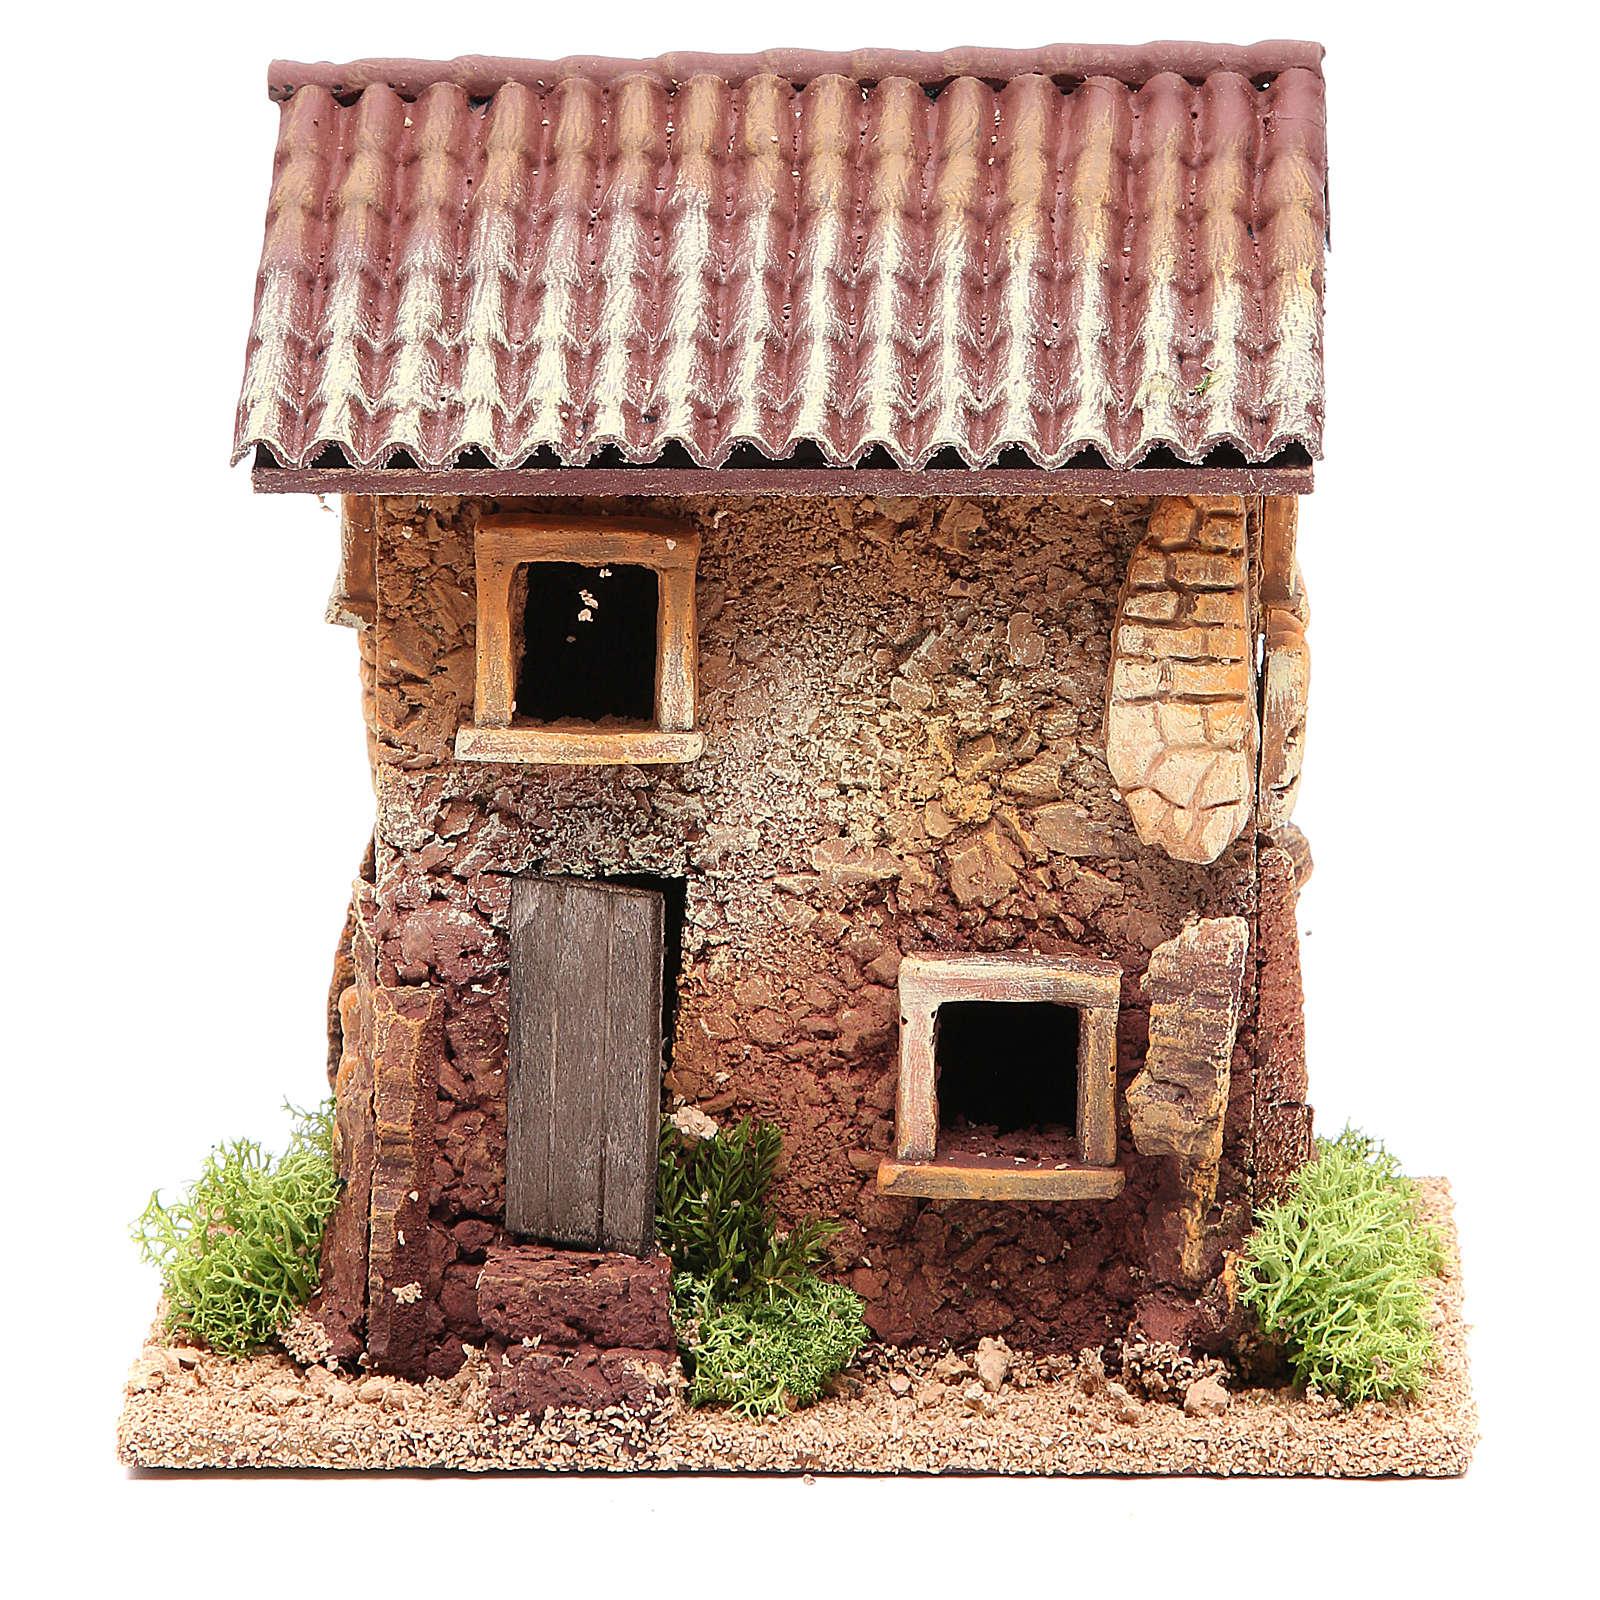 Casa belén corcho 18x18x13 cm 4